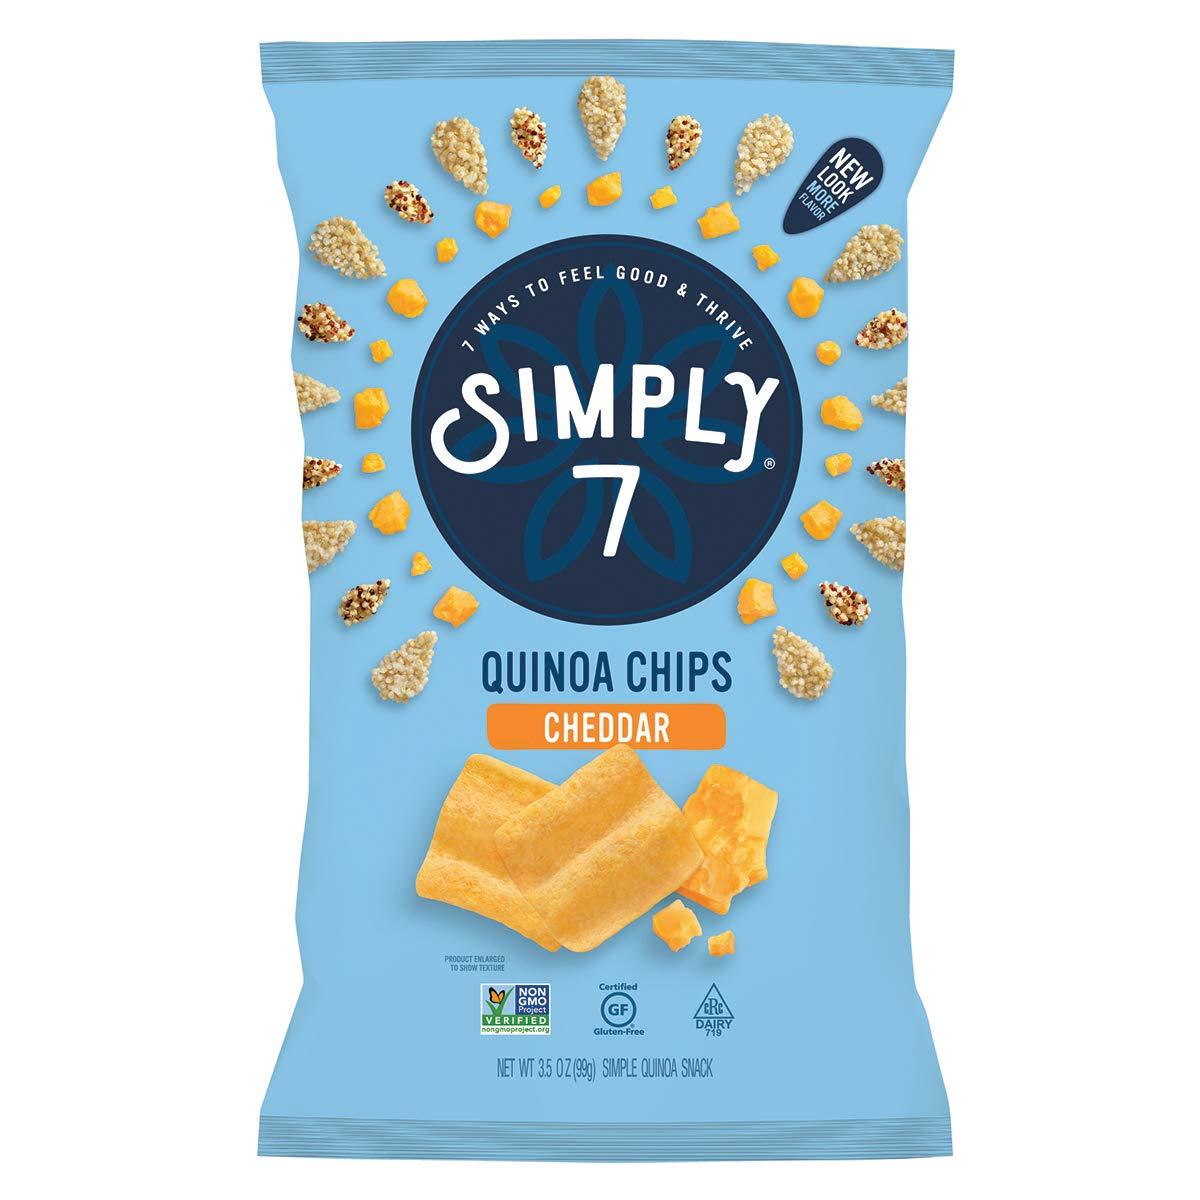 Simply 7 Quinoa Chips Vegan Non-GMO N Sale Special Price Gluten Snacks Kosher New color